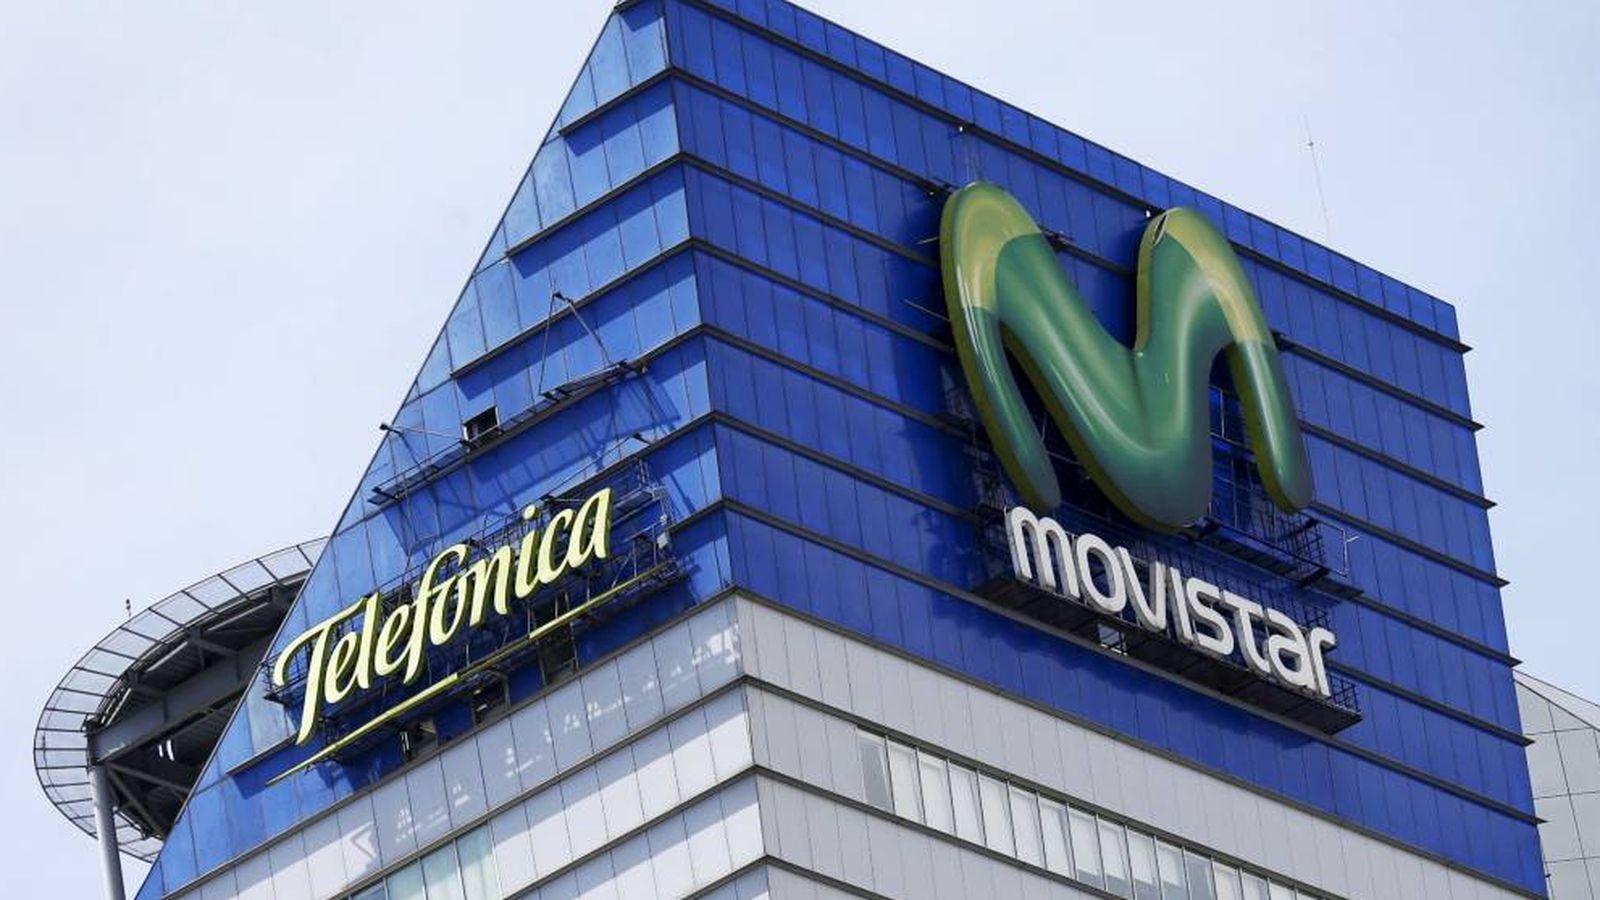 Resultado de imagen de Movistar DEJA sin linea de teléfono e internet durante mas de 18 horas